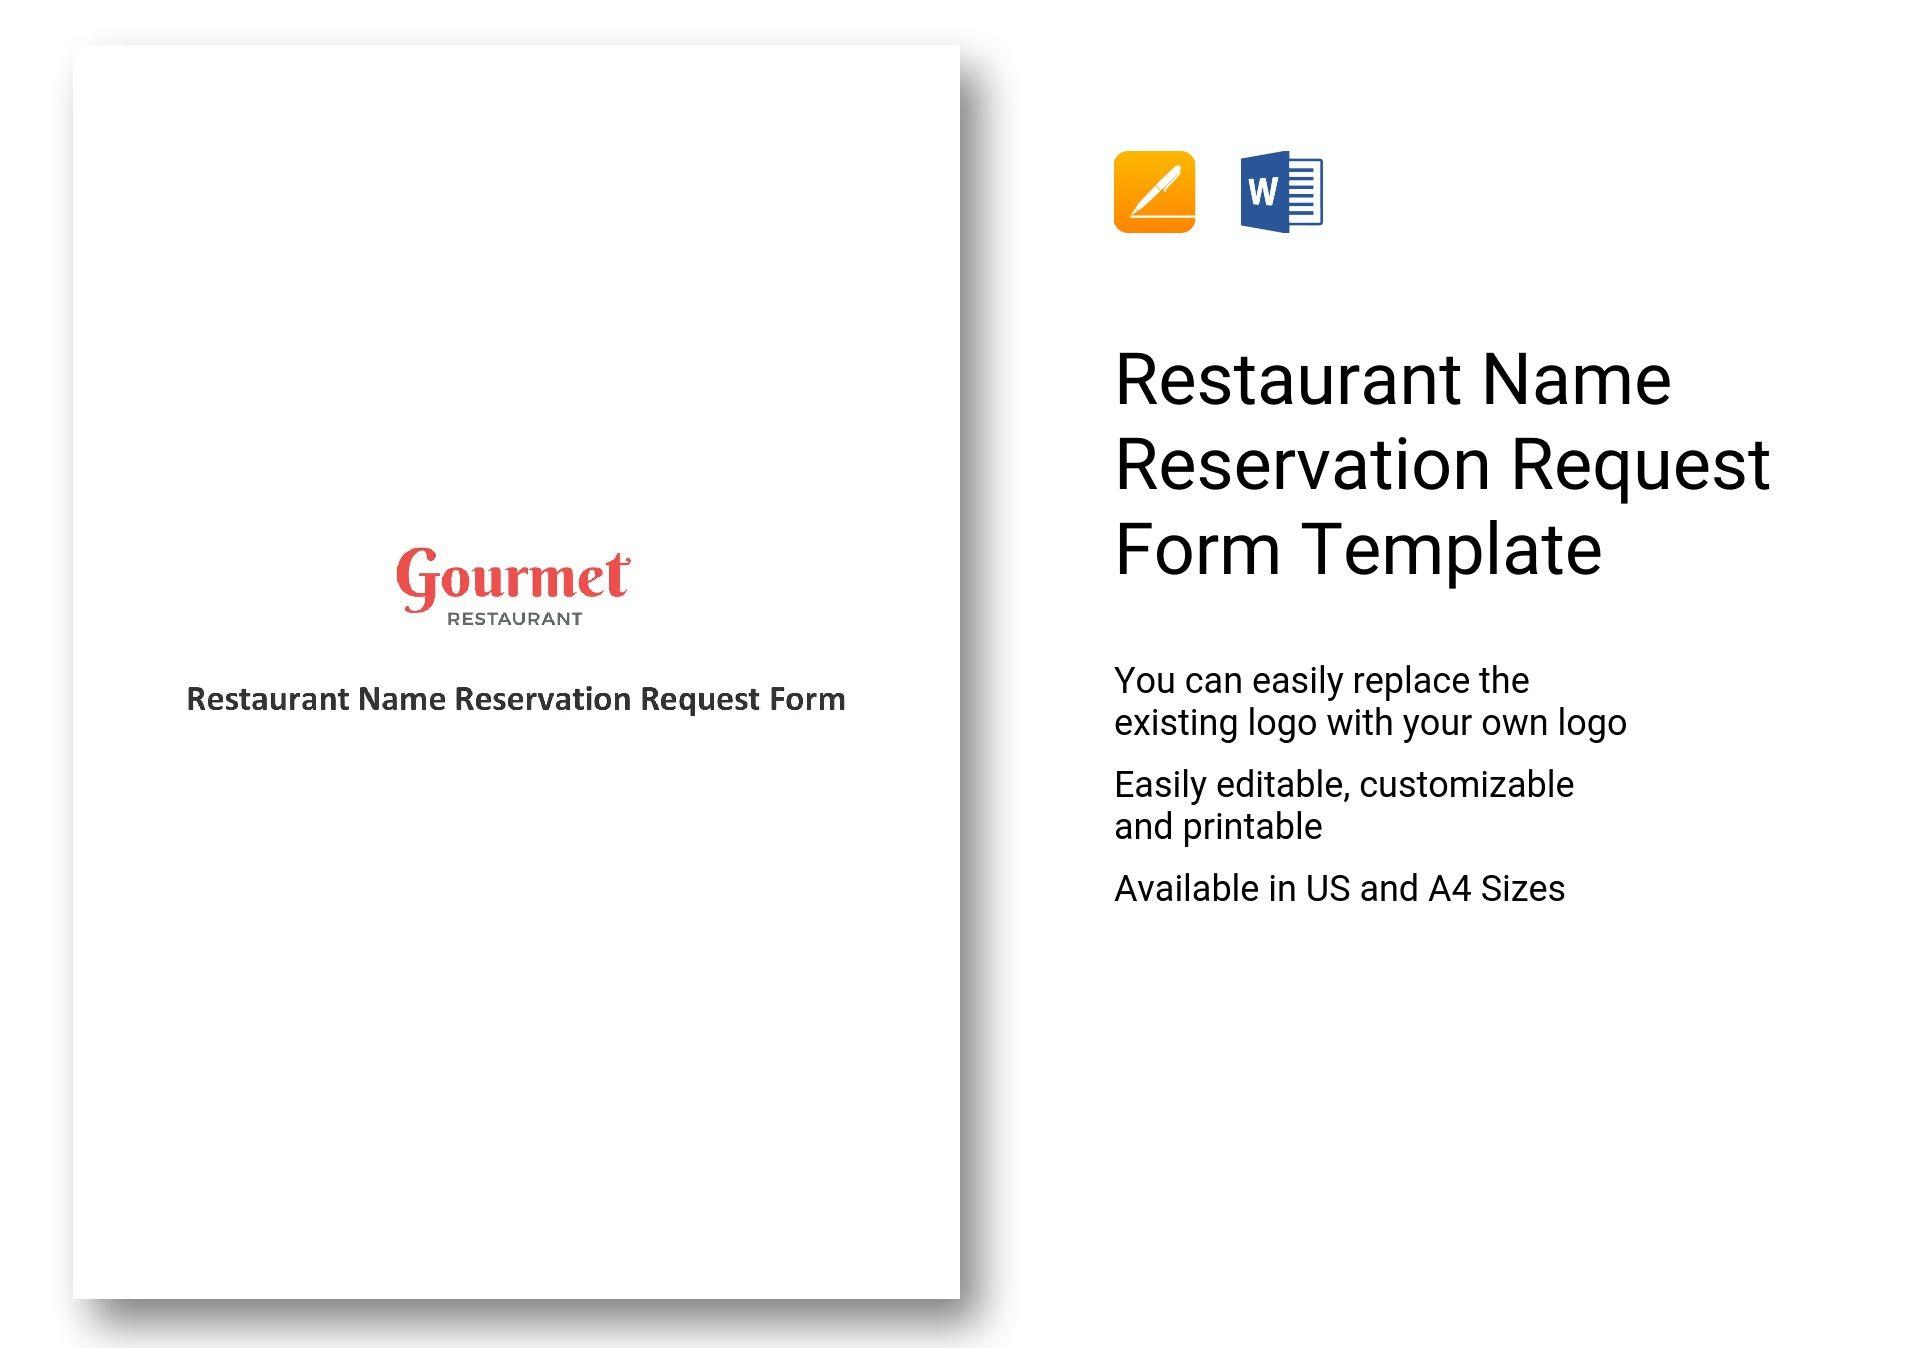 Restaurant Name Reservation Request Form